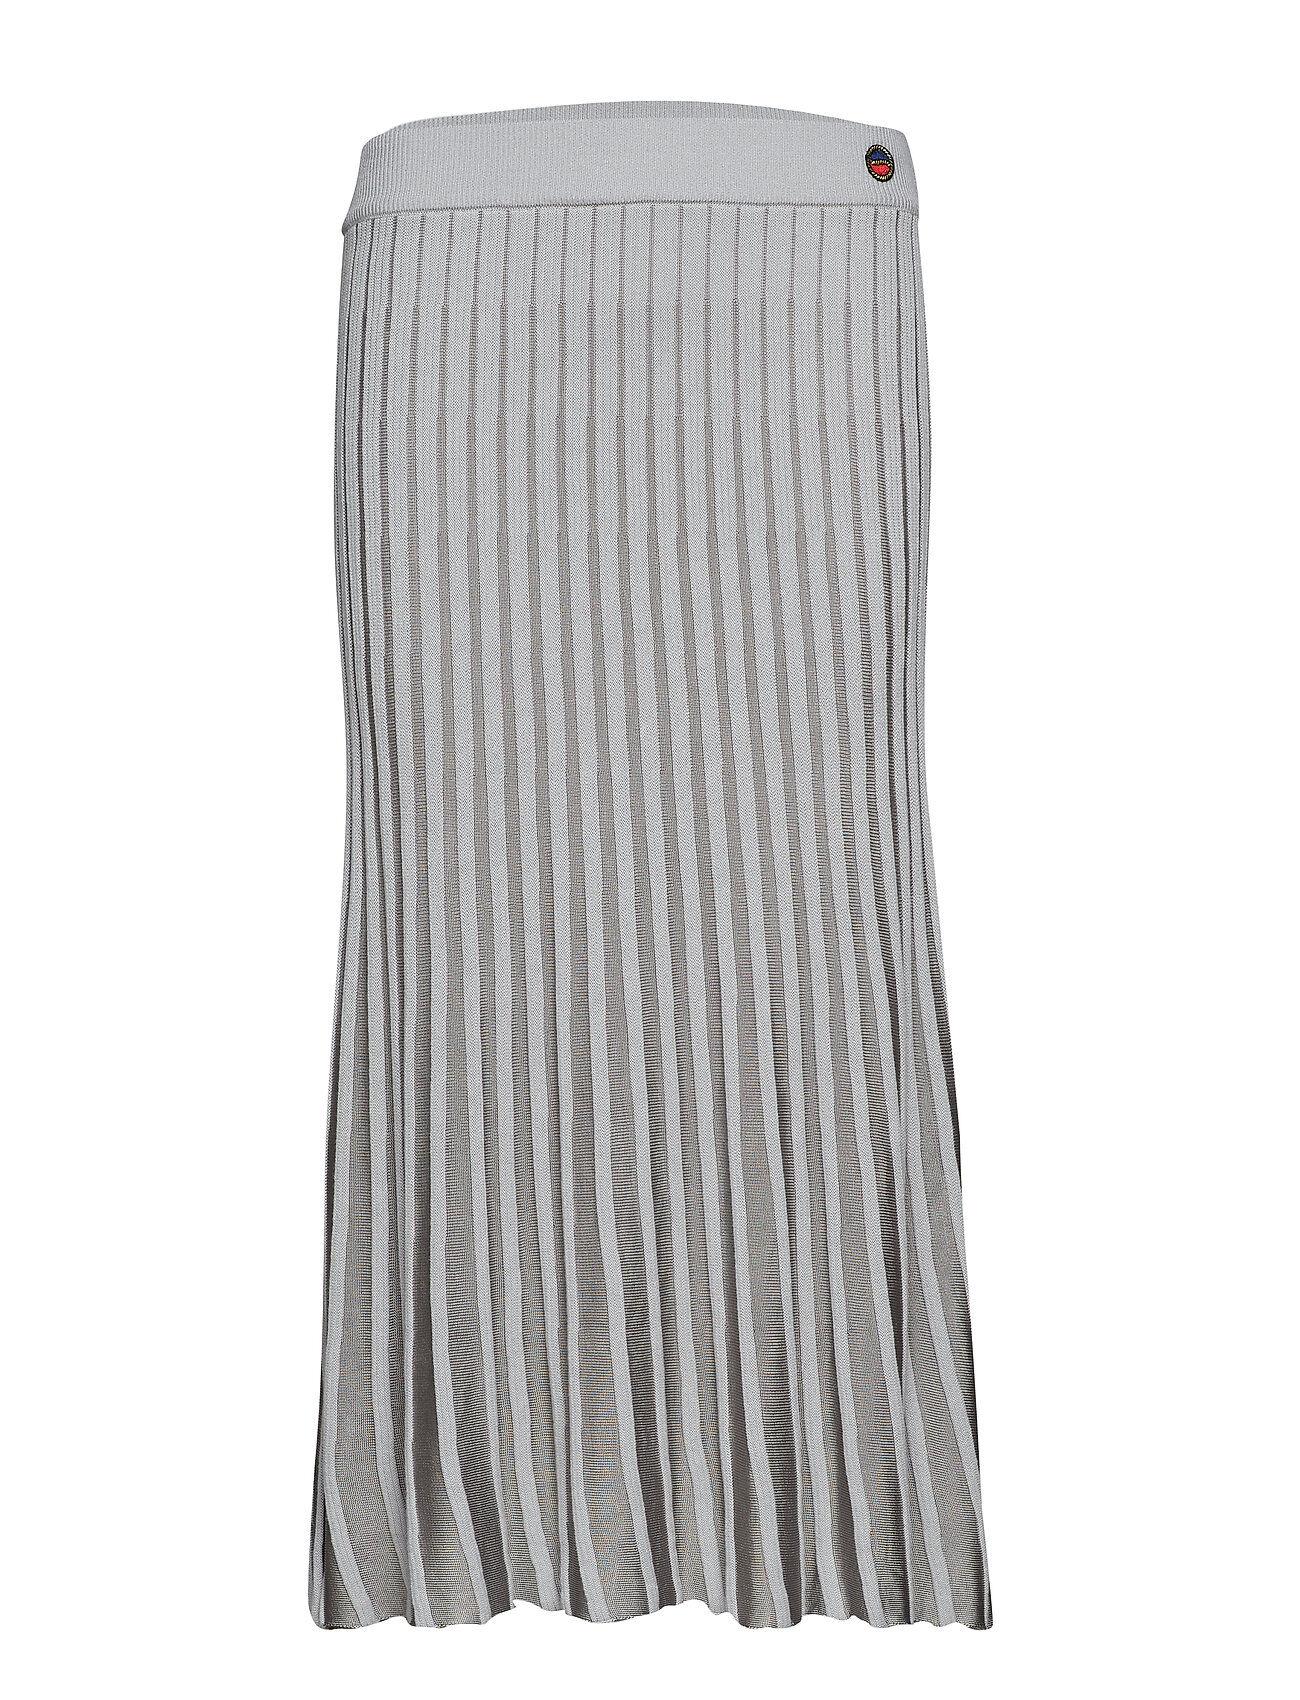 BUSNEL Callac Skirt